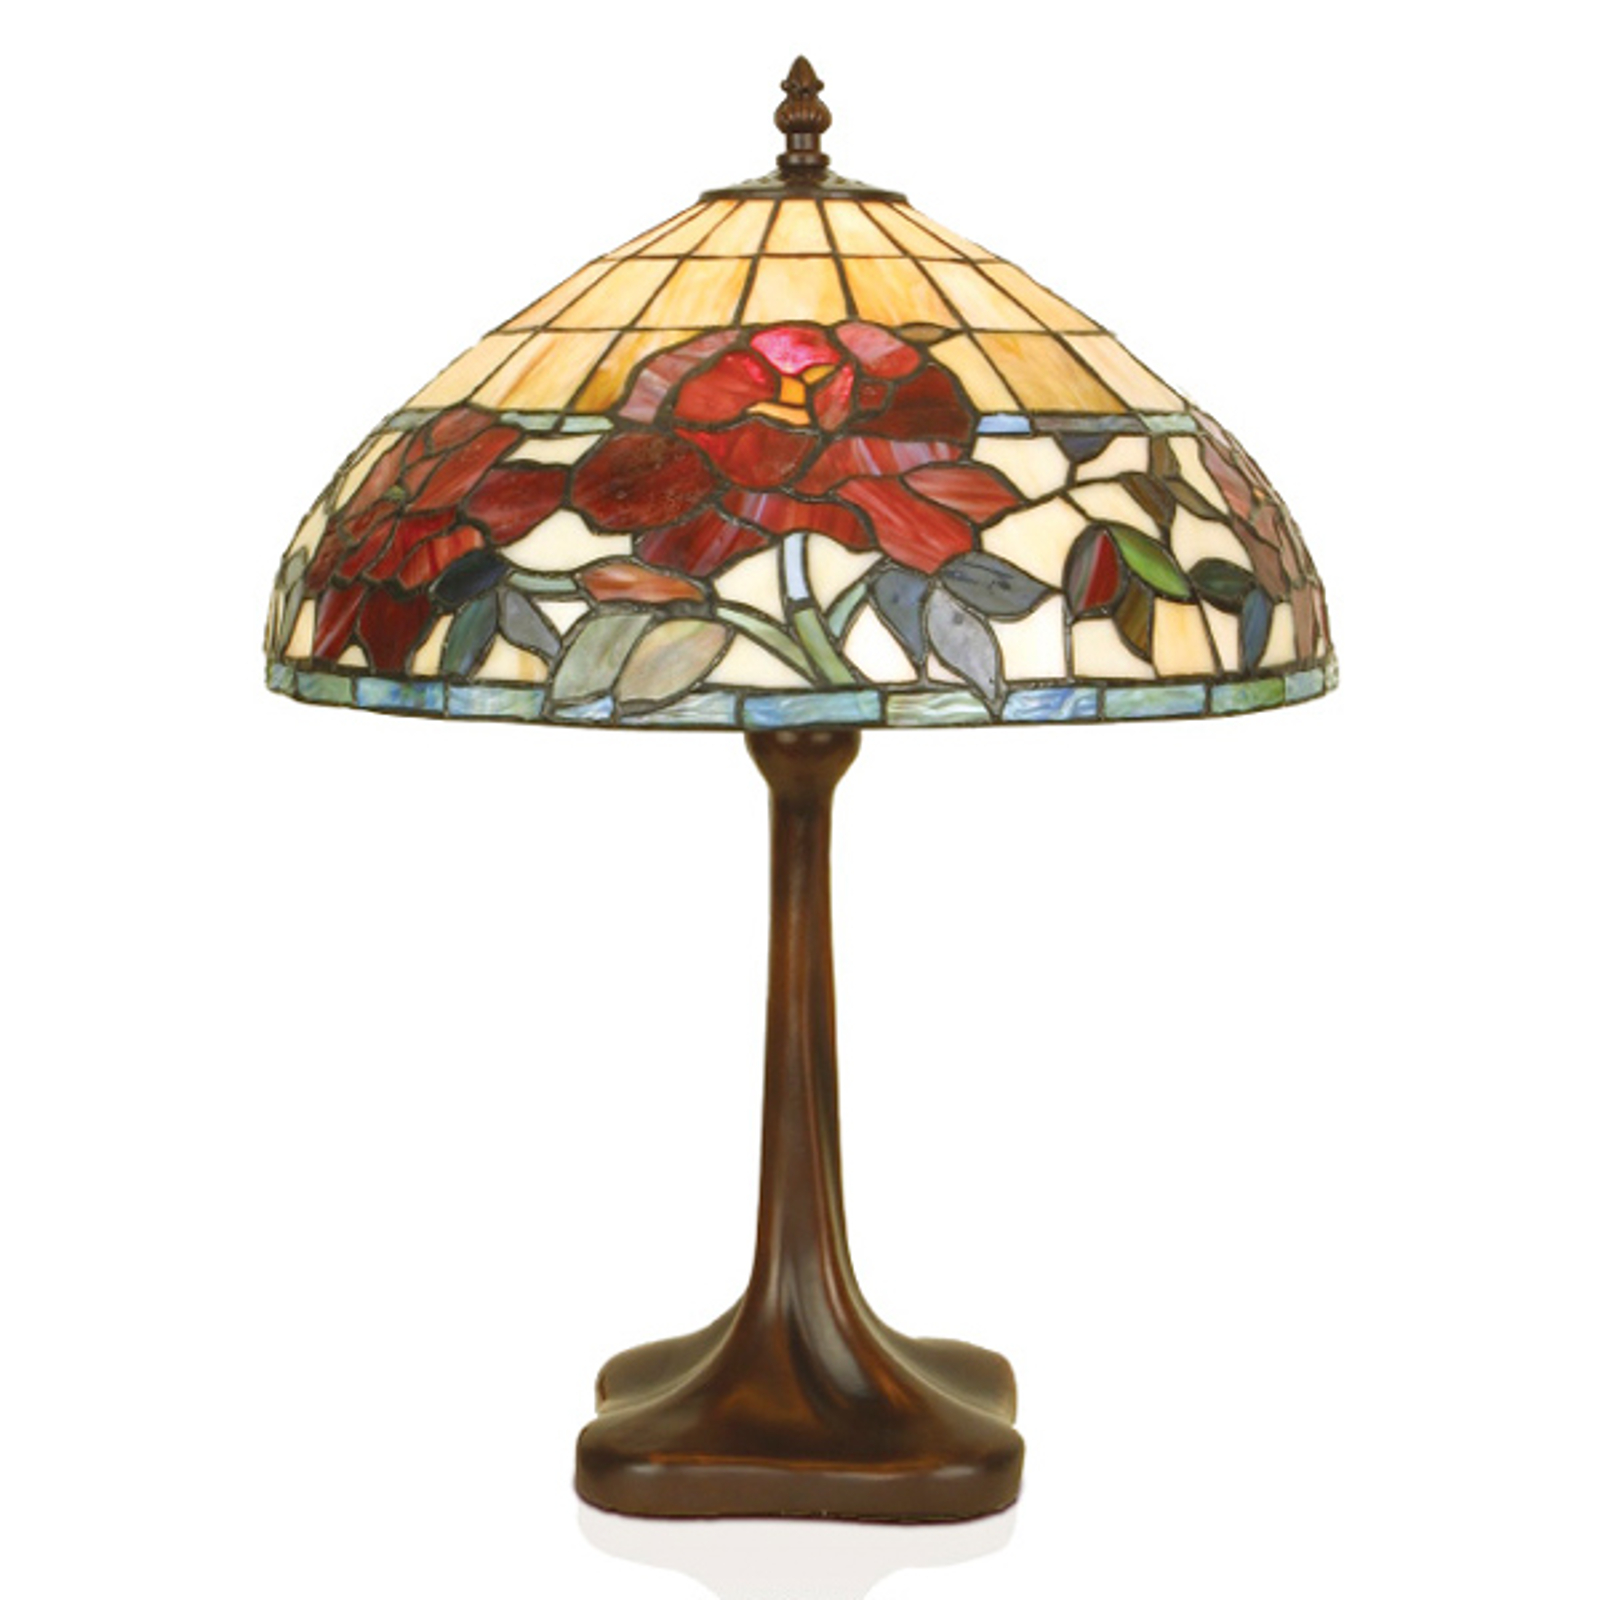 Ručne vyrobená stolná lampa FINNA_1032178_1